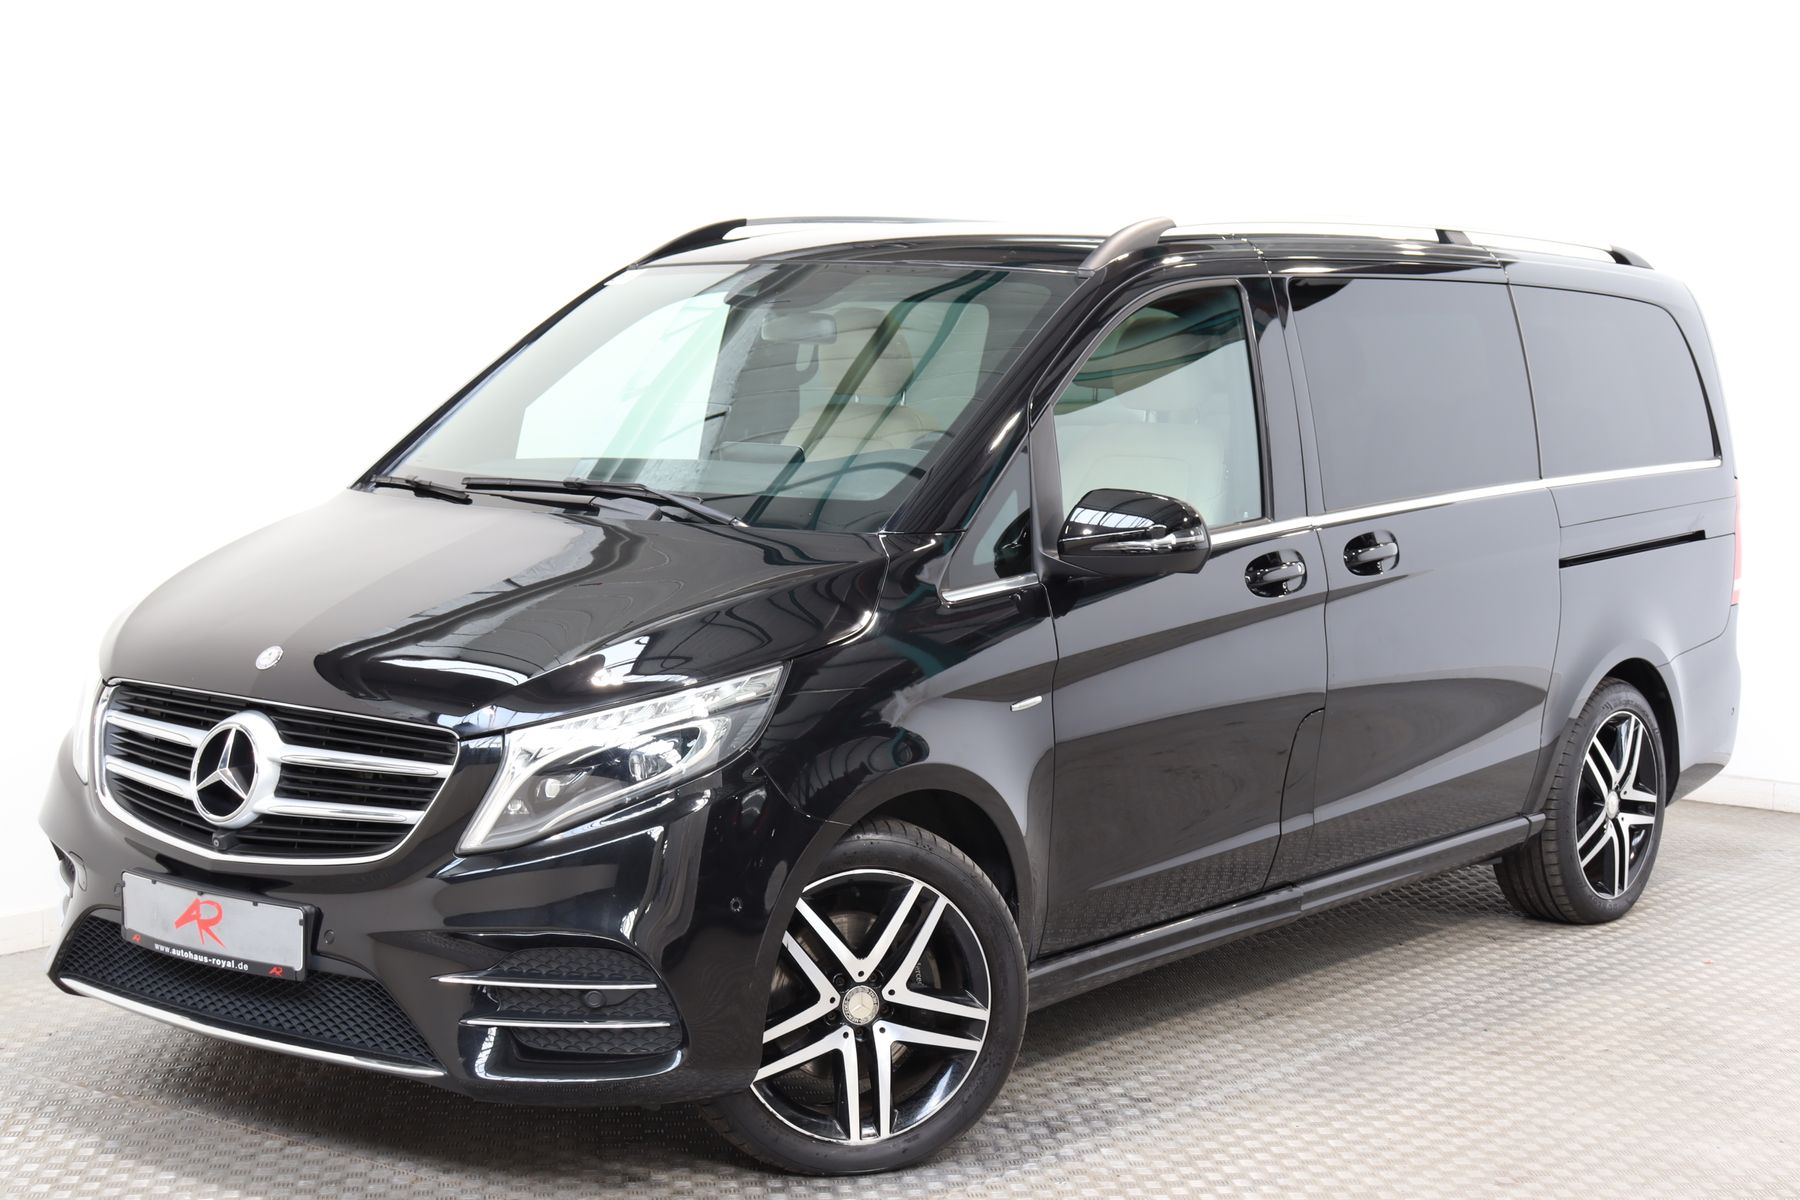 Mercedes-Benz V 250 d 4M LANG 7 SITZE AMG LINE 360GRAD,COMAND, Jahr 2016, Diesel